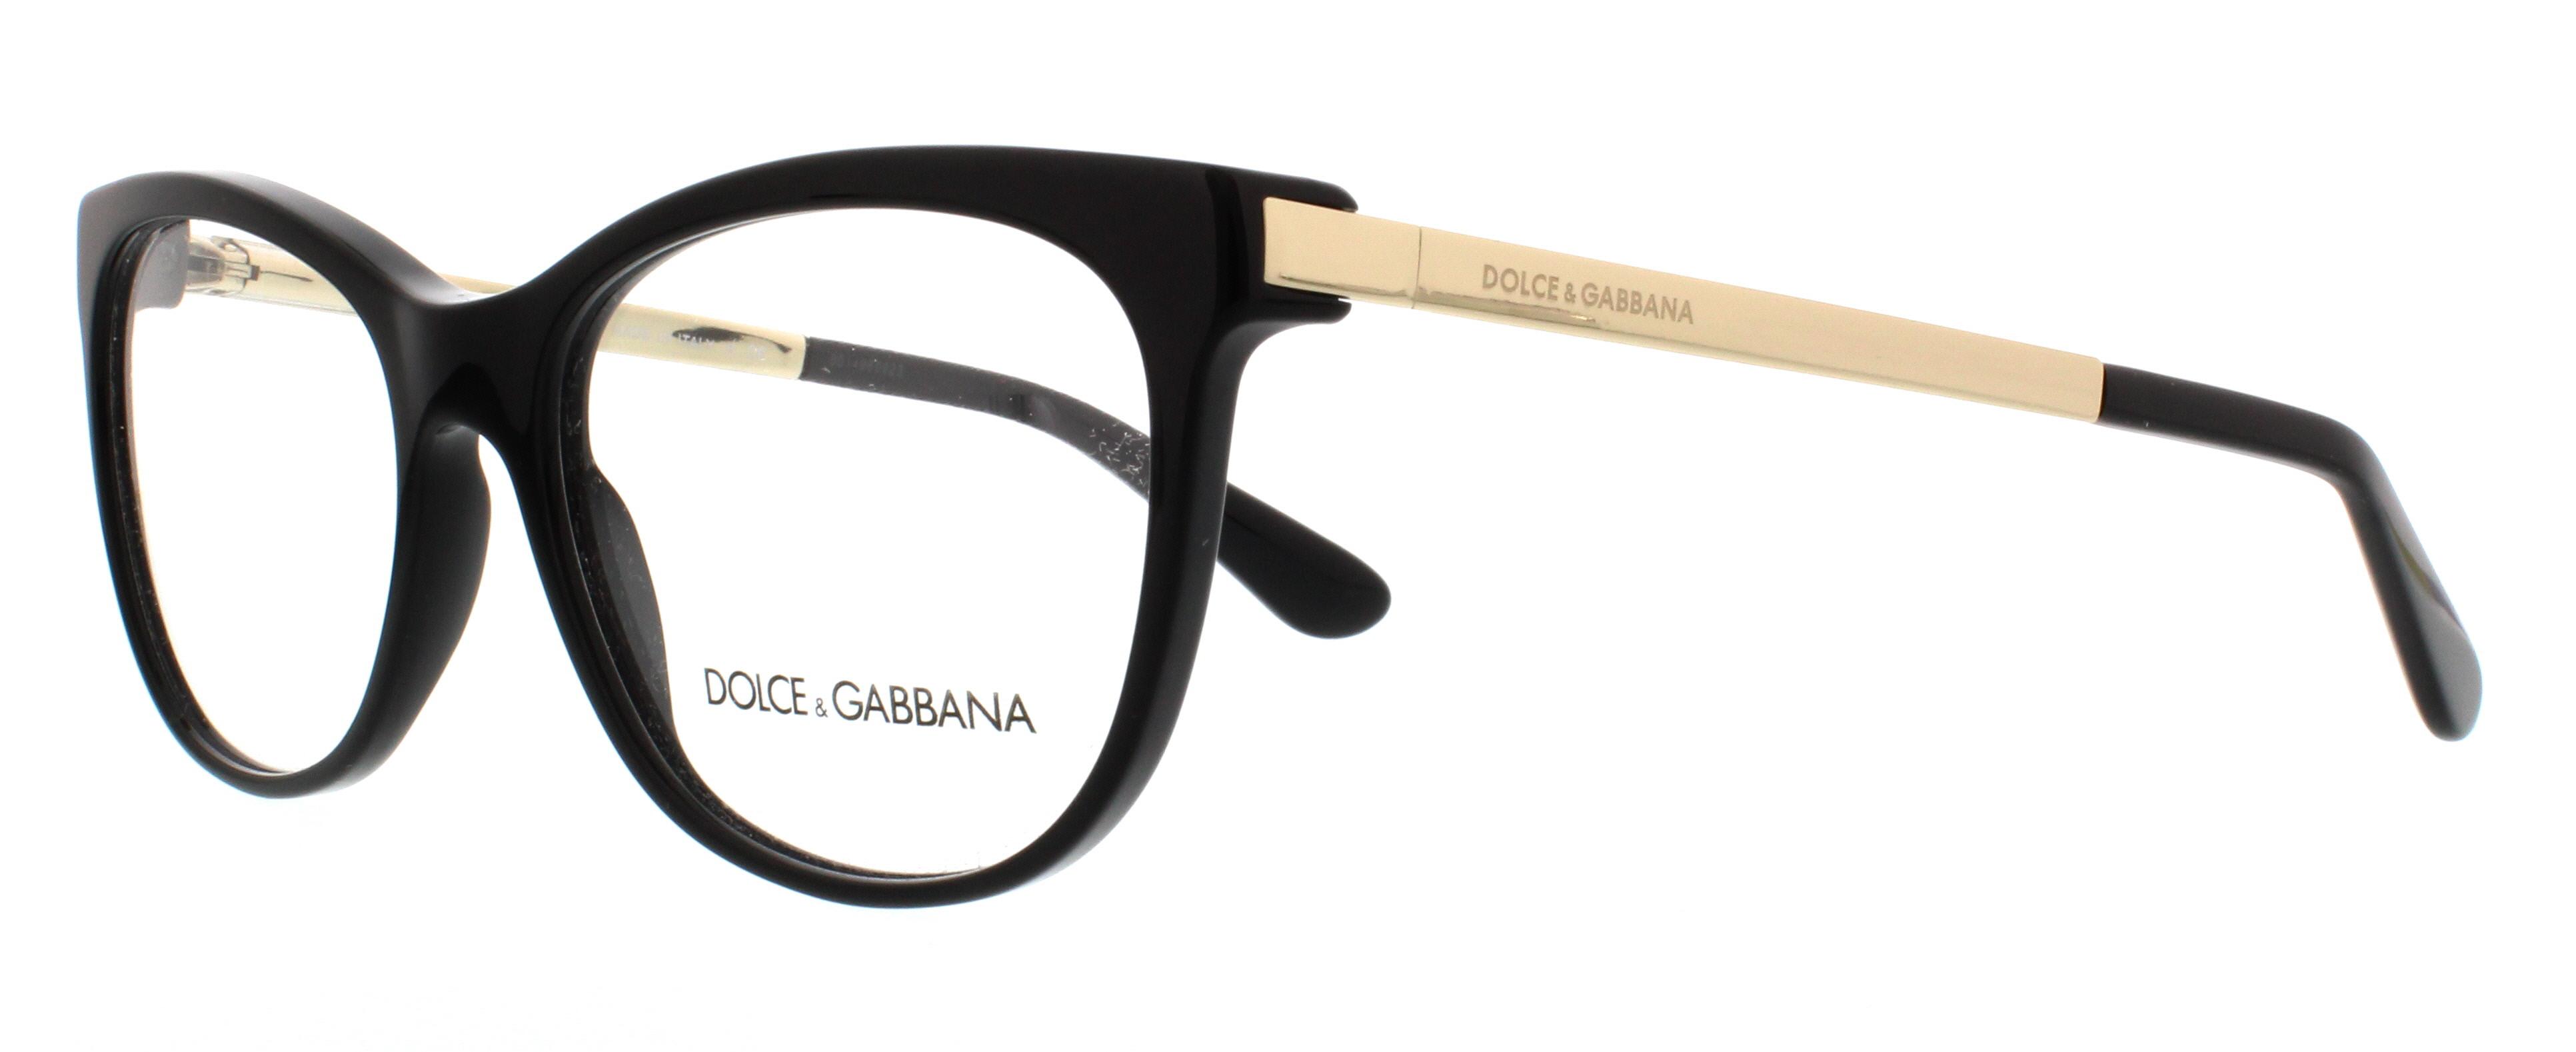 DOLCE & GABBANA Eyeglasses DG3234 501 Black 54MM 8053672421828 | eBay